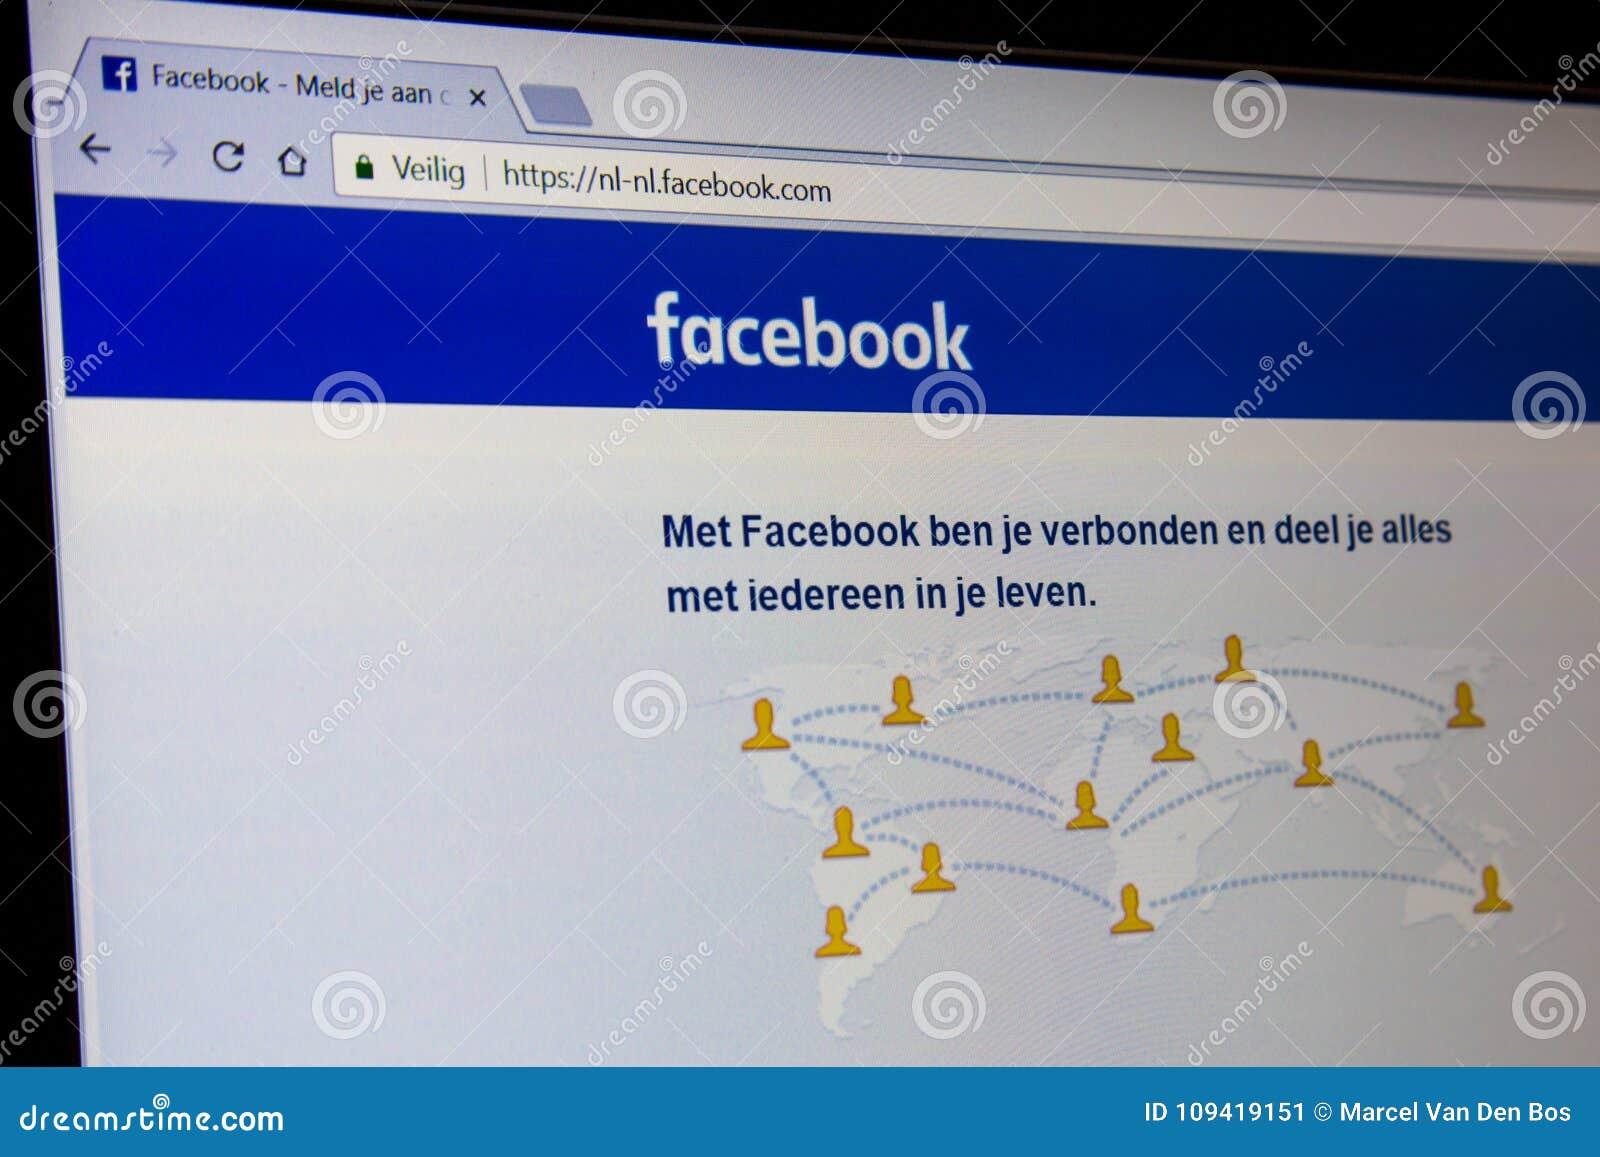 De Nederlandse homepage van Facebook met adresbar